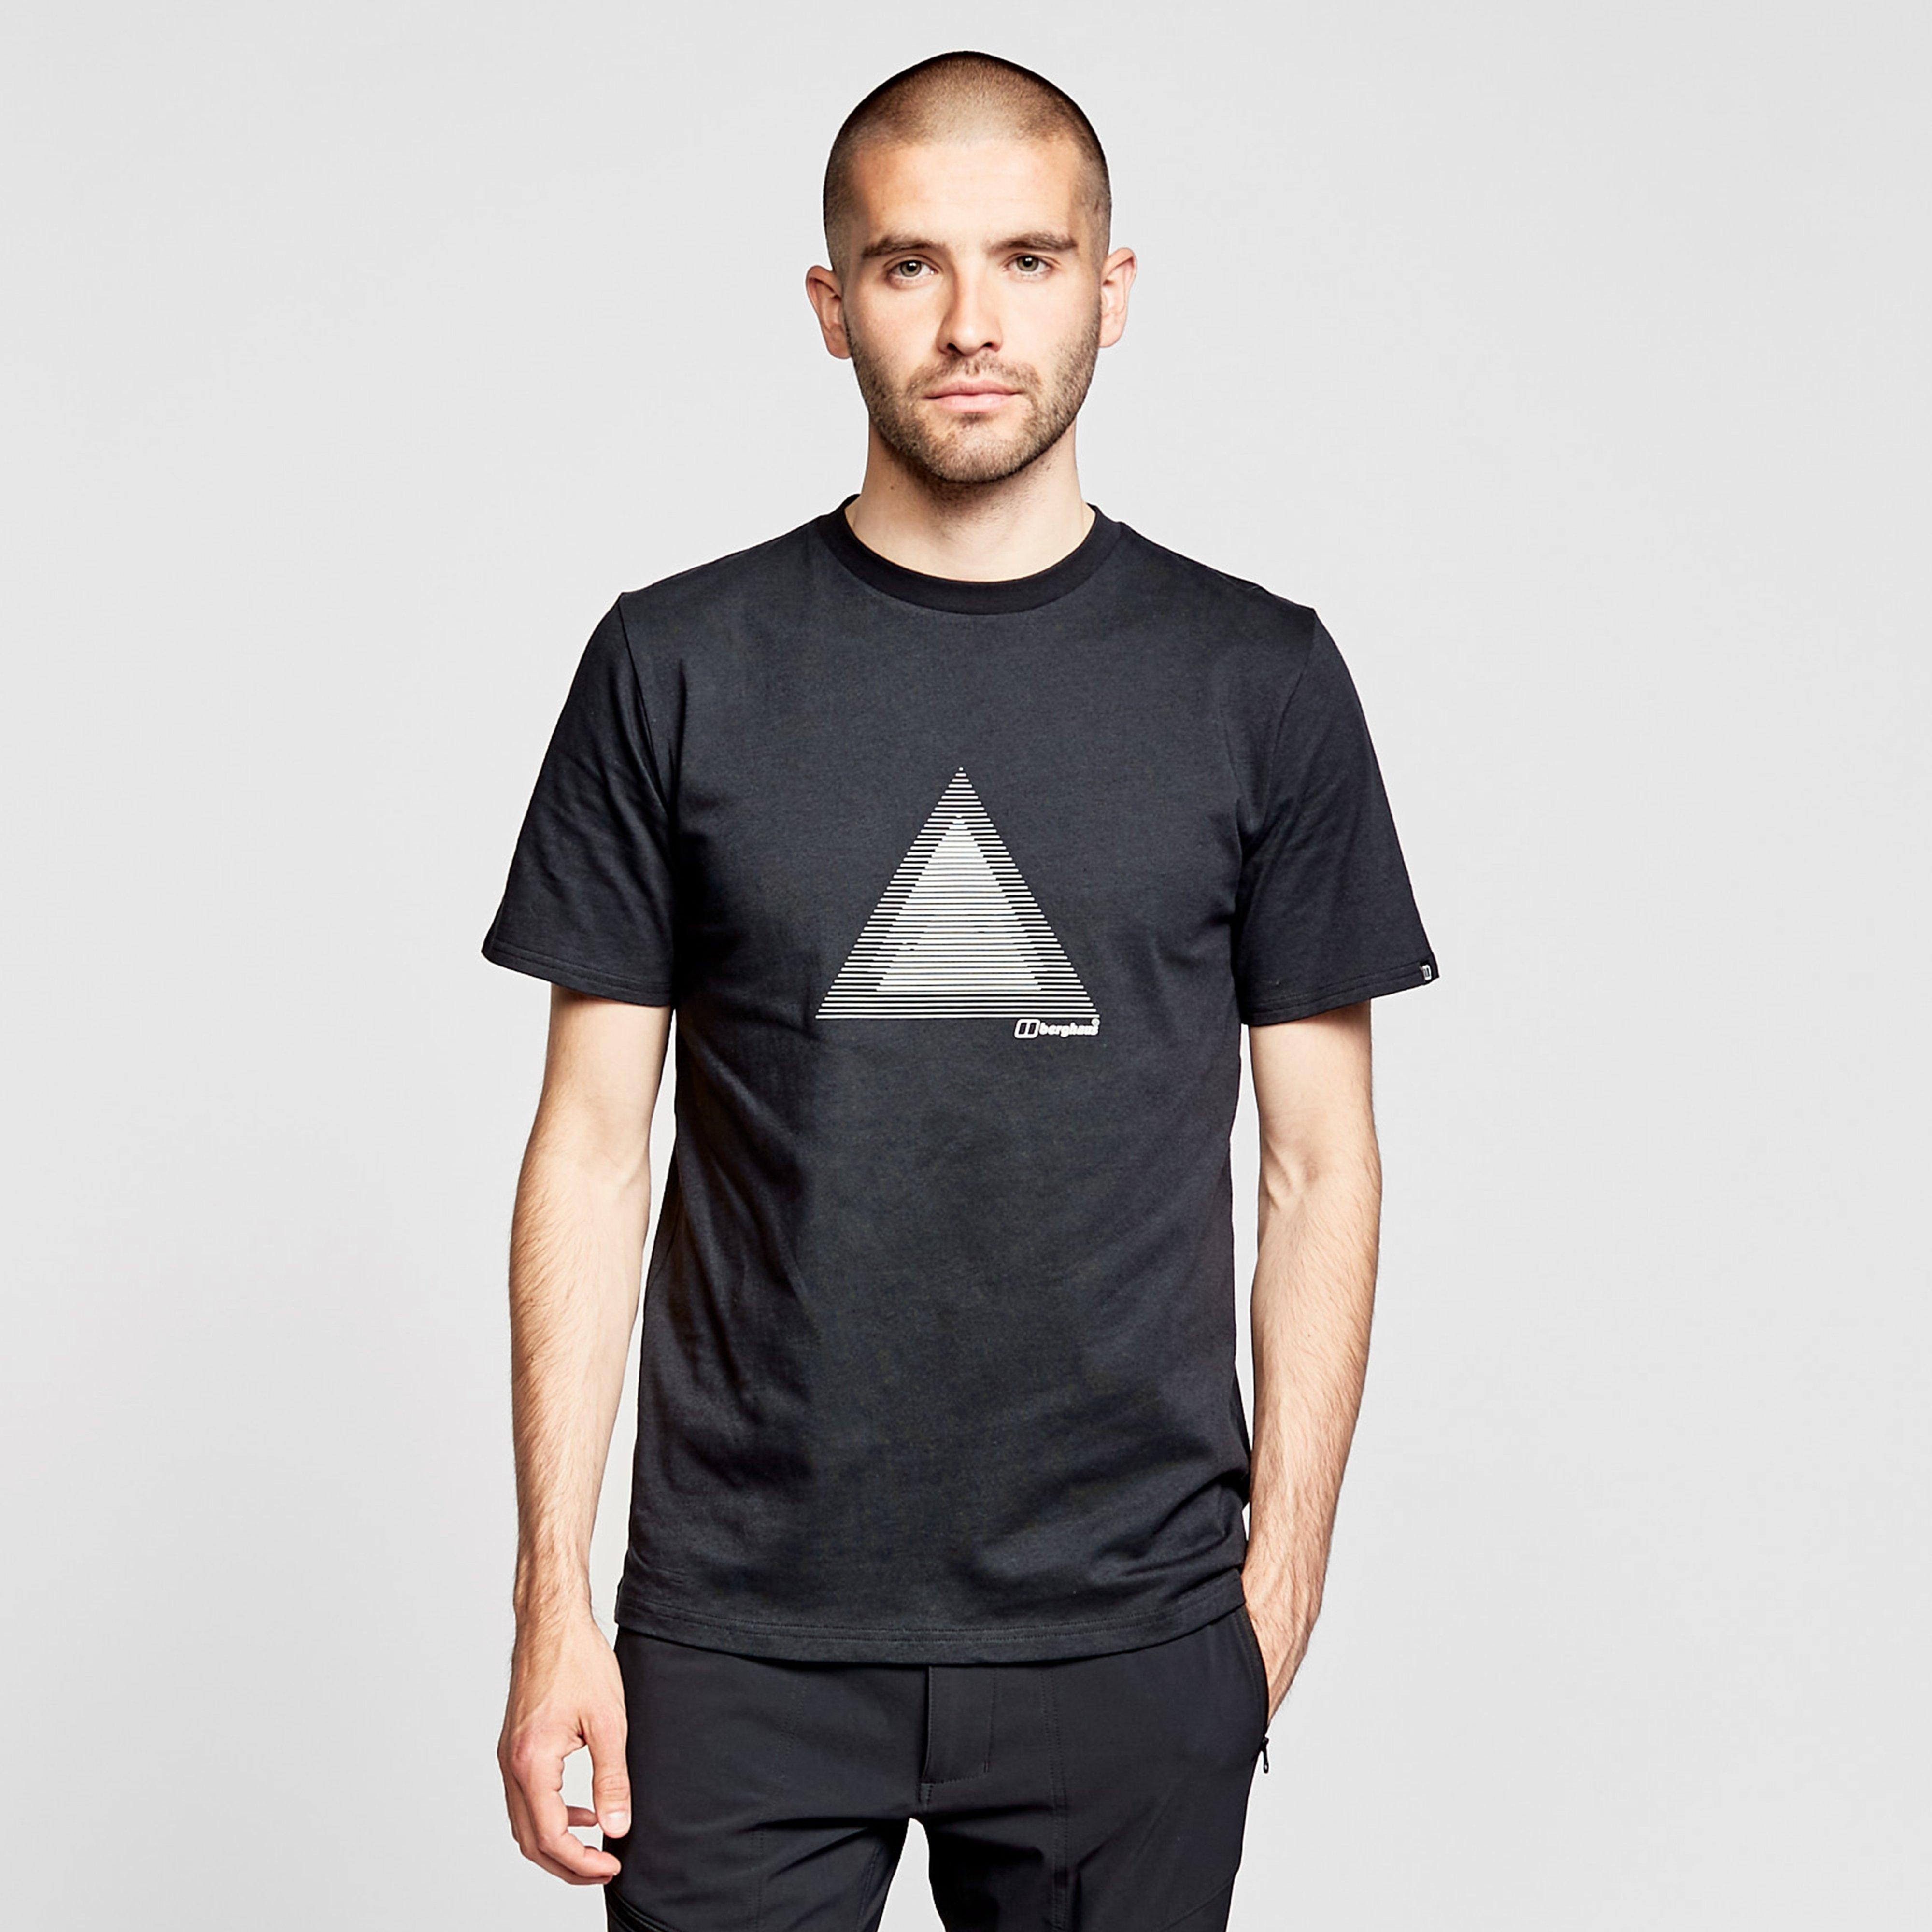 Berghaus Mens Modern Mountain T-shirt - Black/black  Black/black